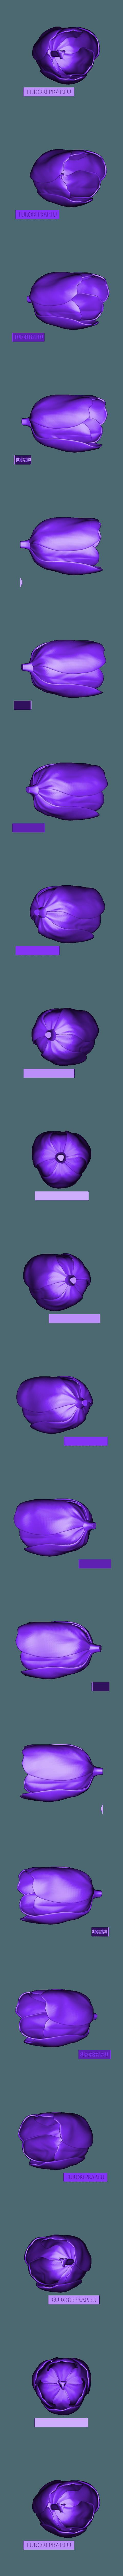 euroreprap_flower-tulip_c.stl Download STL file flowers: Tulip - 3D printable model • 3D printable design, euroreprap_eu